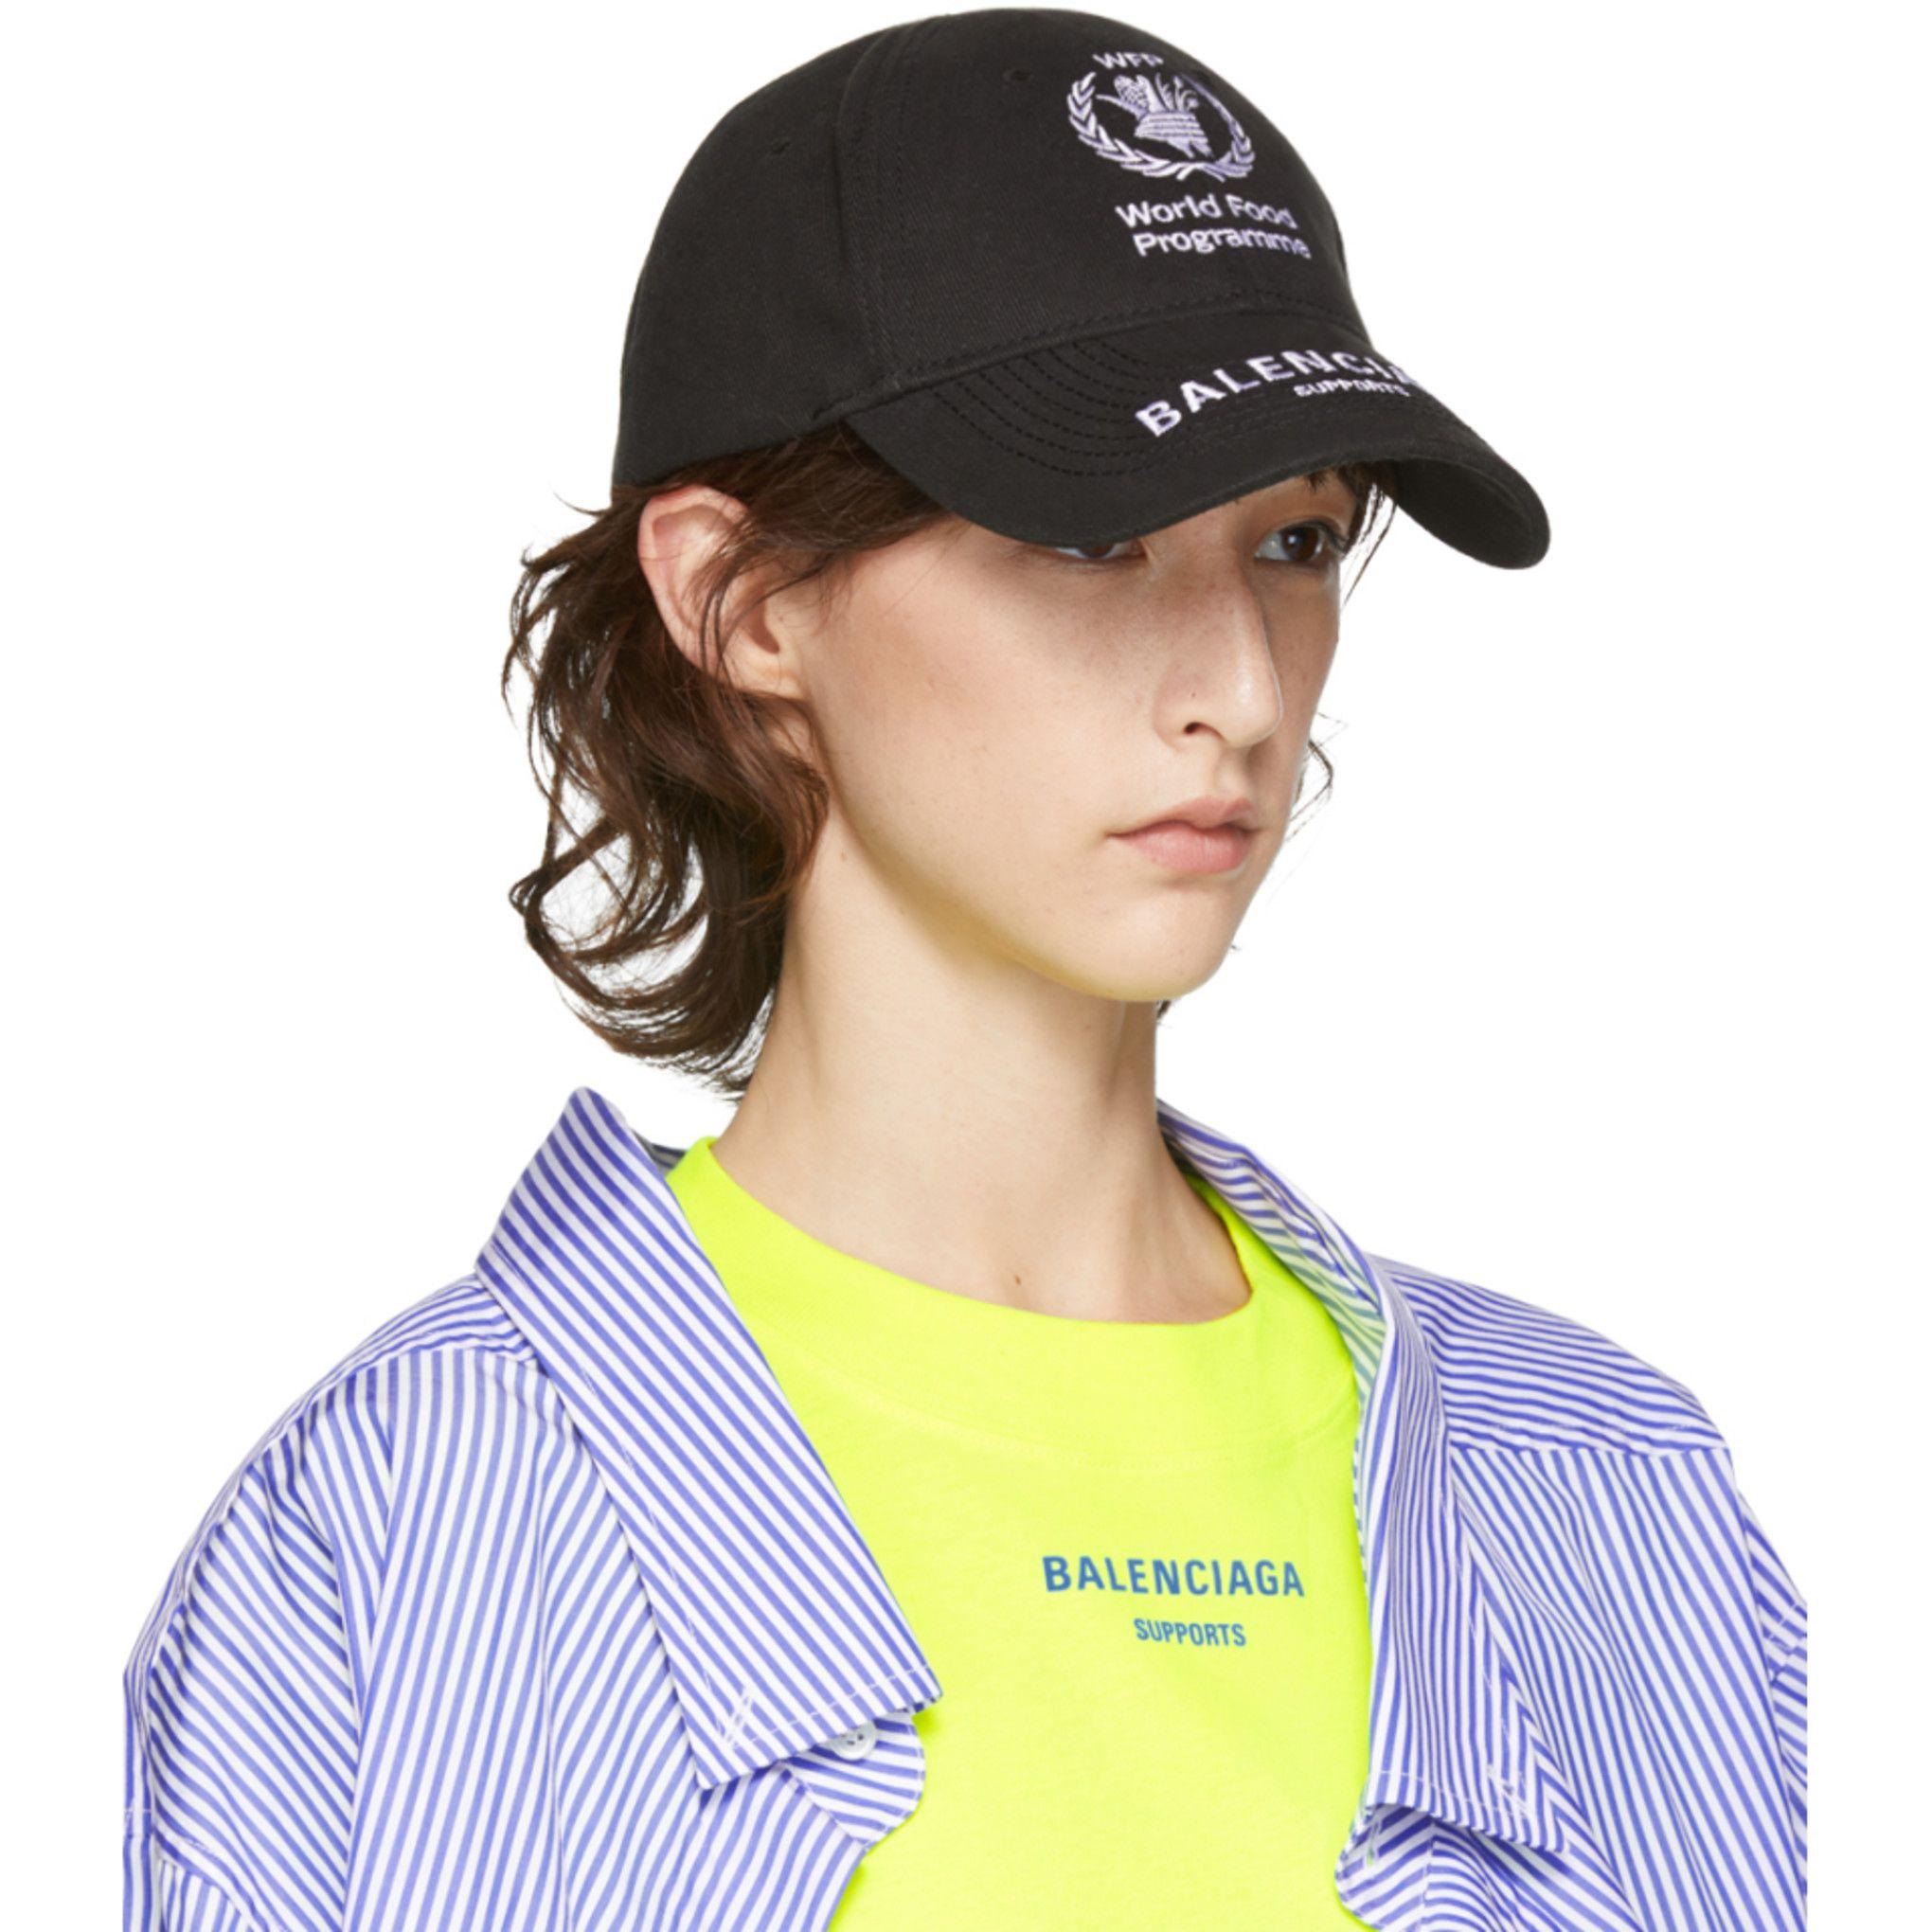 e16f2be959d1f Balenciaga - Black World Food Programme Embroidered Cap